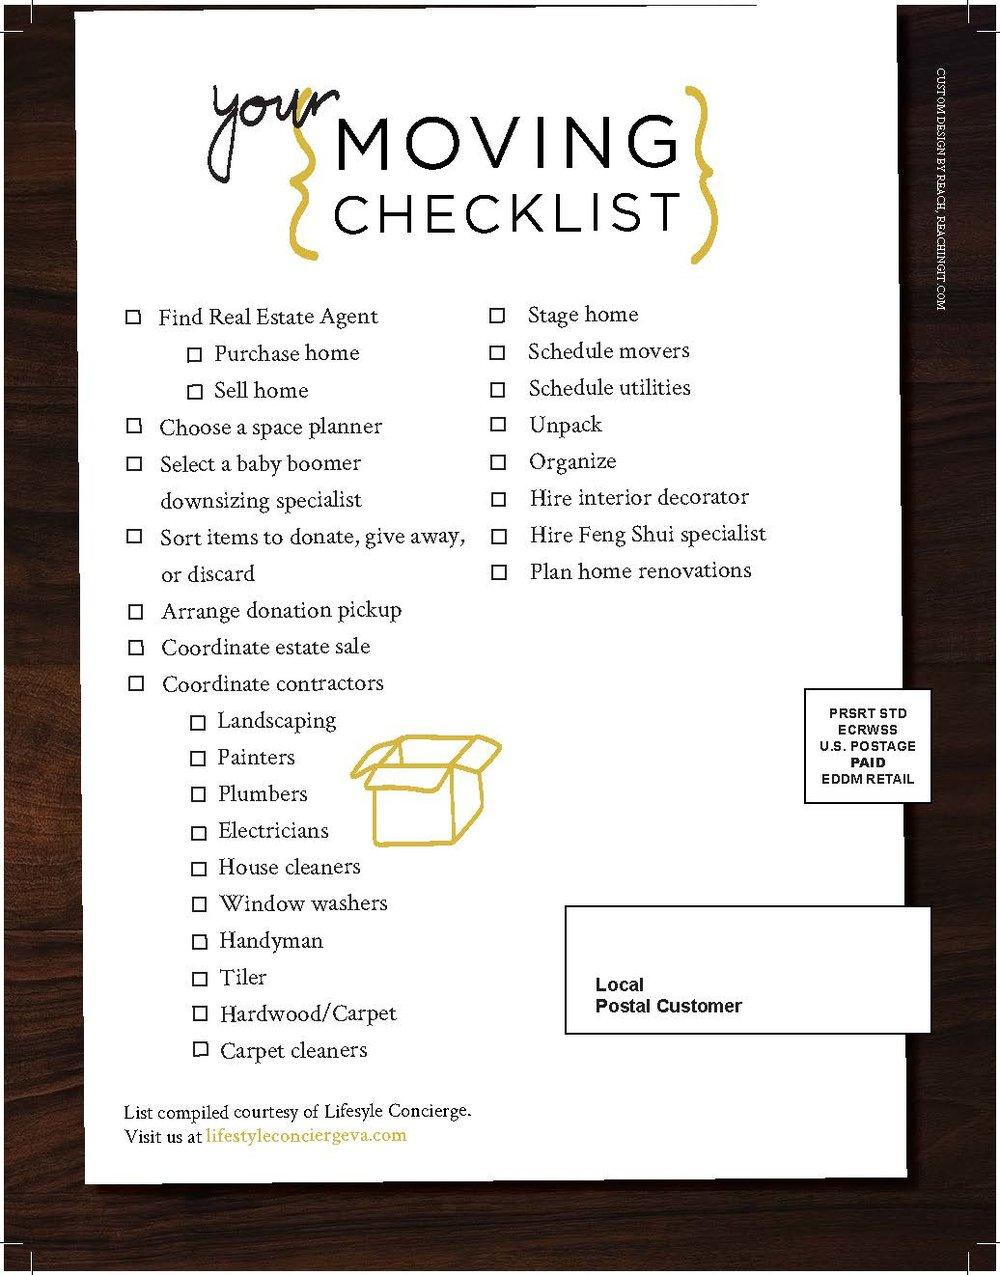 lifestyle_concierge checklist mailer_PRINT2_Page_1.jpg